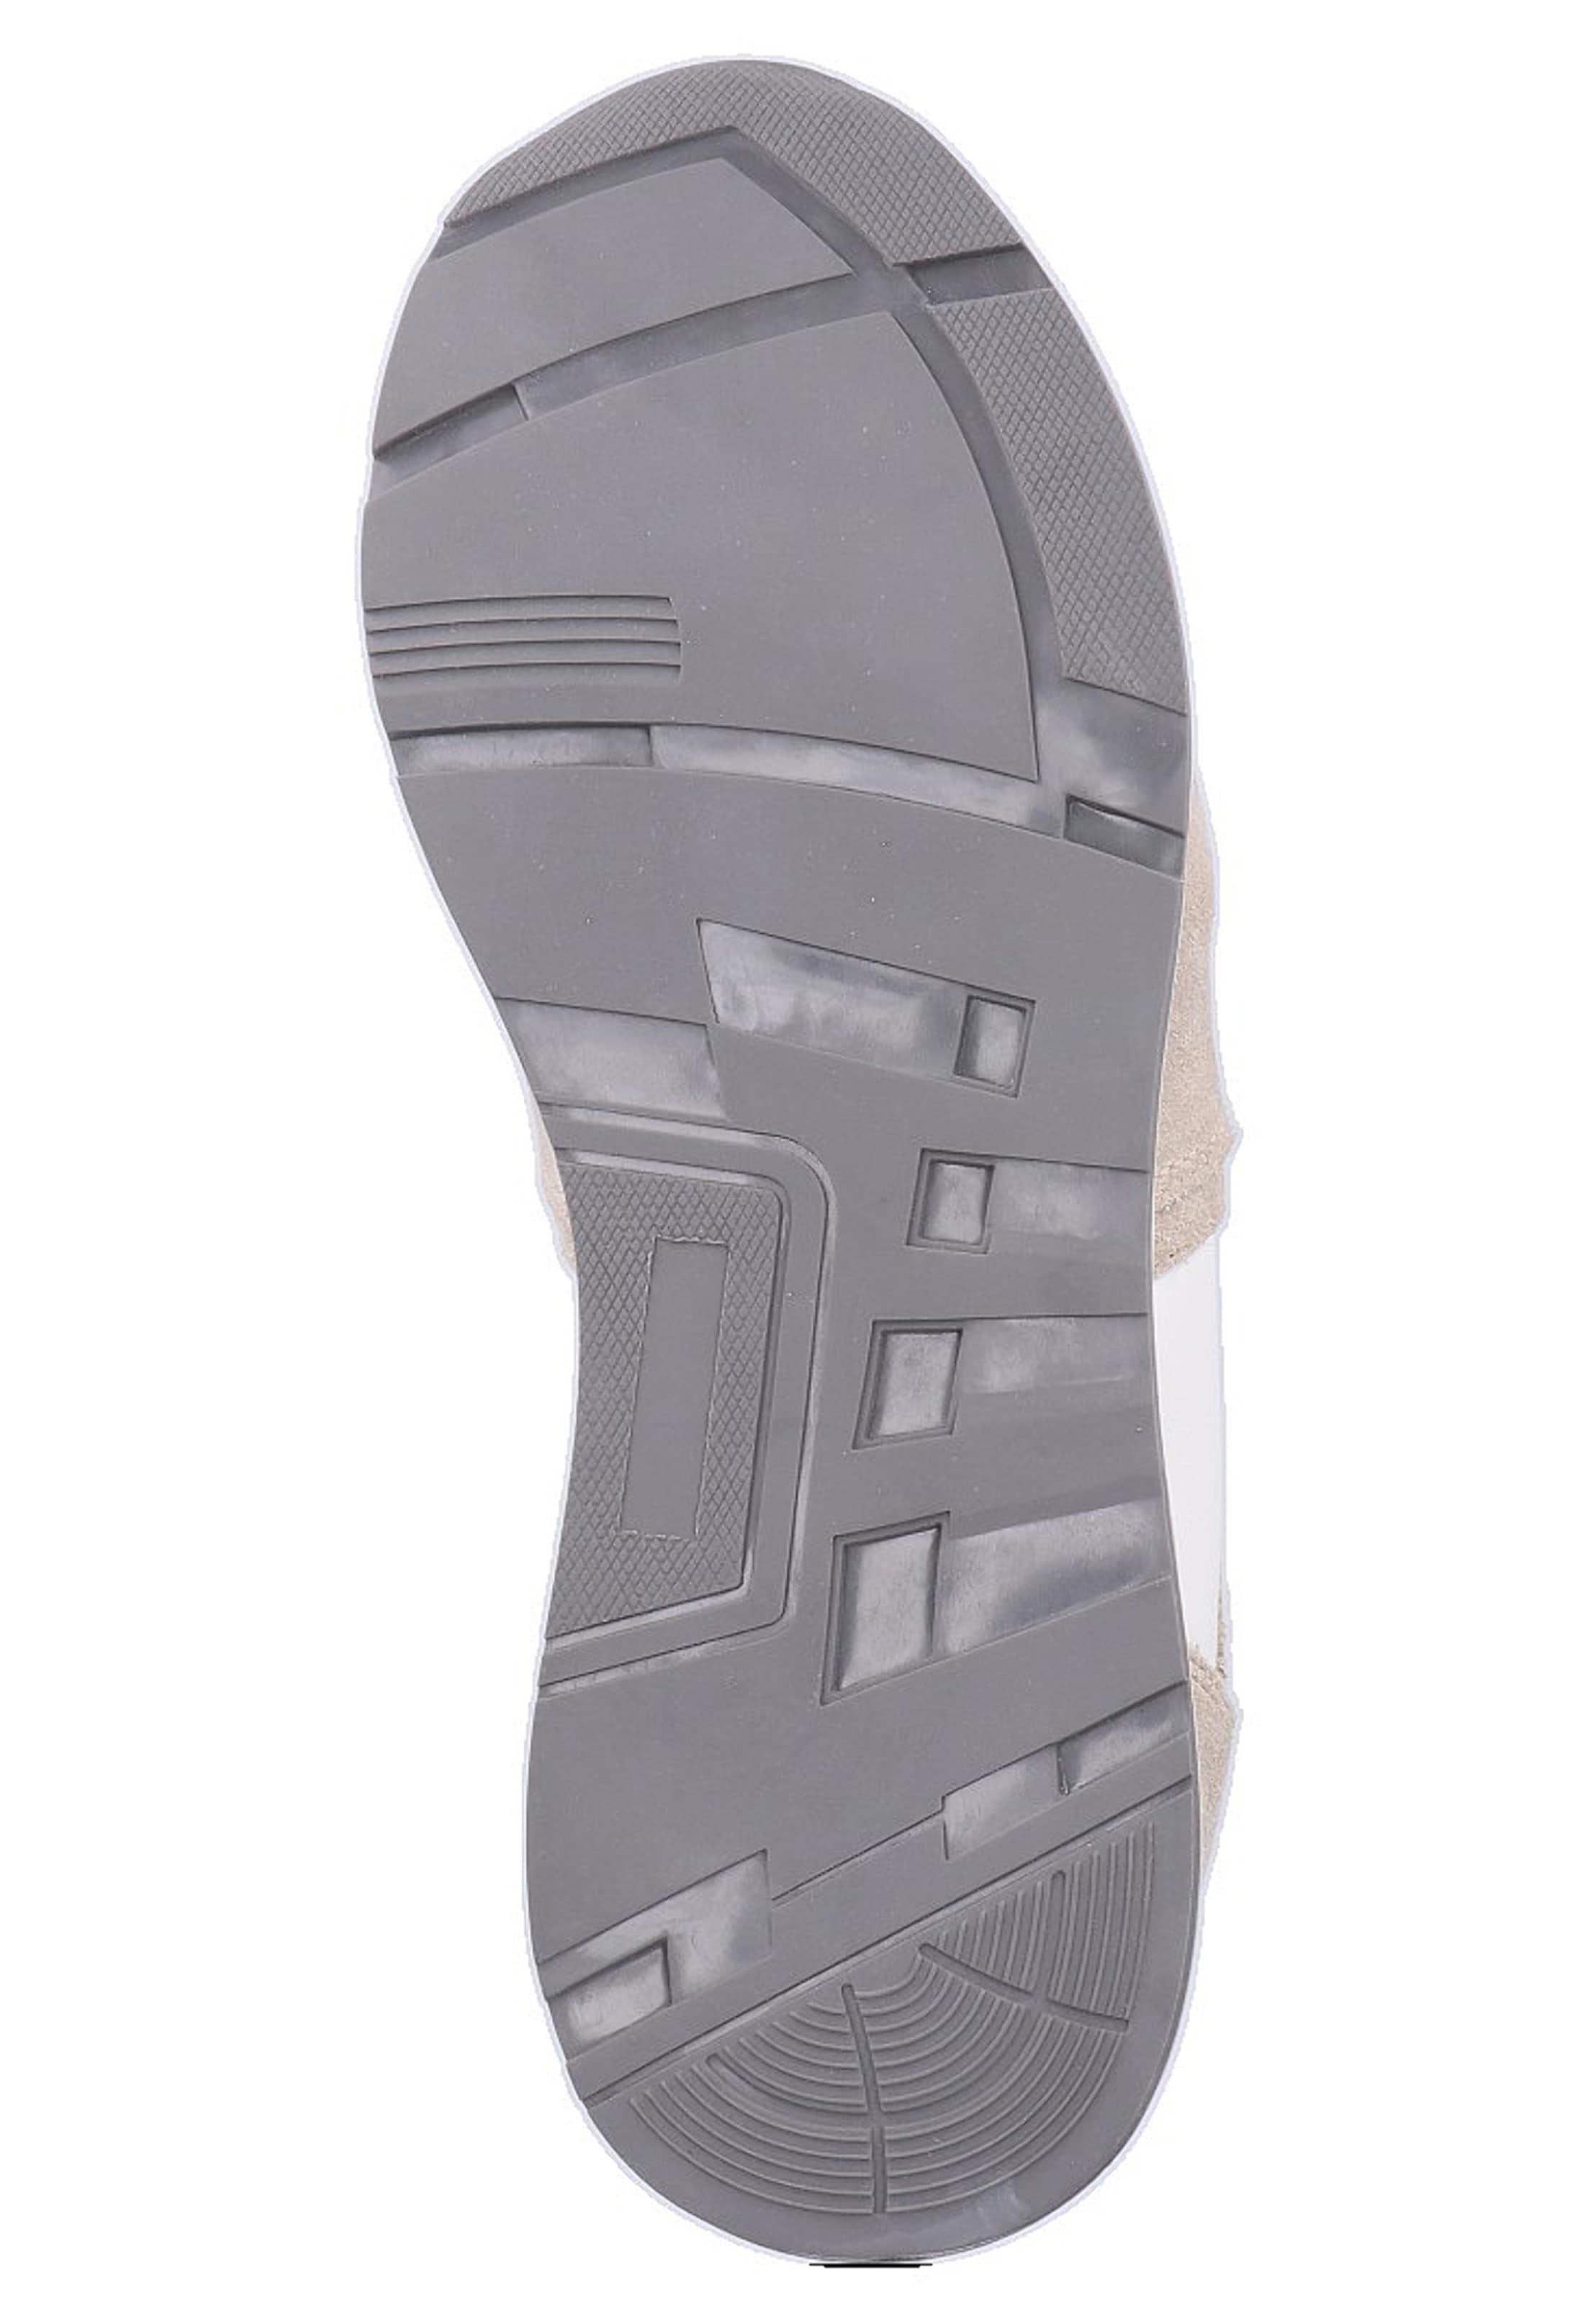 Sneaker Sneaker Sneaker In Strellson CremeWeiß Strellson In CremeWeiß Strellson In CremeWeiß Strellson pzVSMU